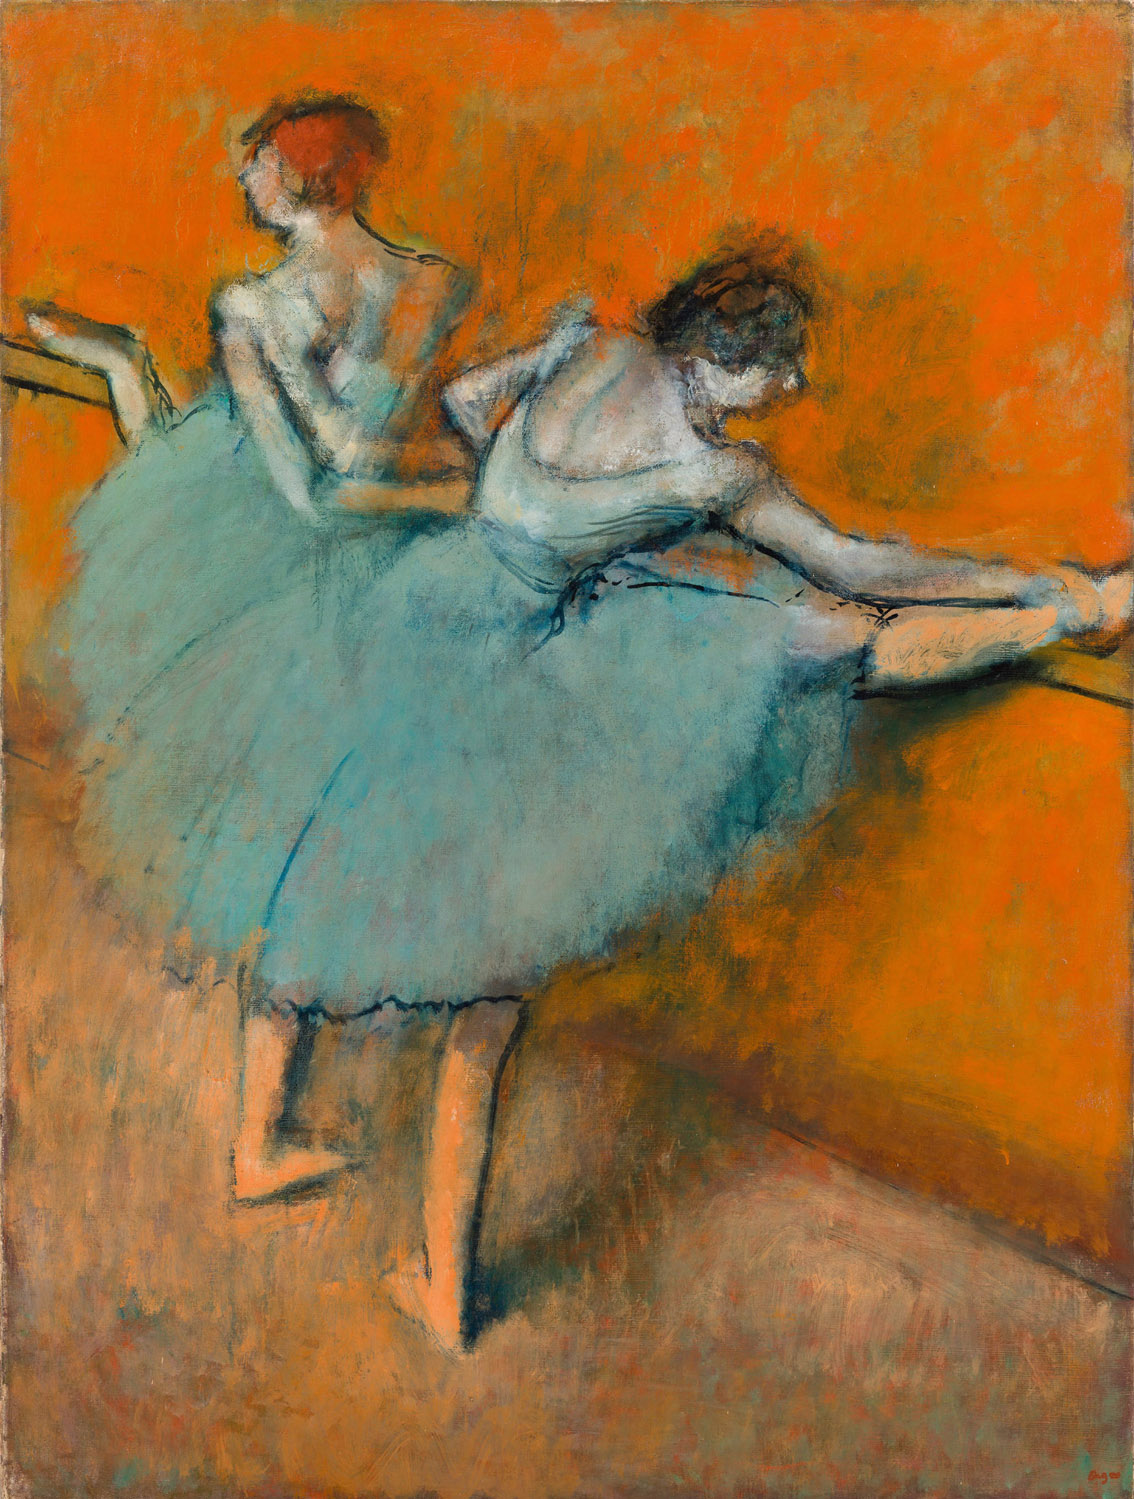 Bailarinas en la barra, por Hilaire-Germain-Edgar Degas, h. 1900, óleo sobre lienzo, 130,2 x 97,8 cm, The Phillips Collection, Washington, D.C., adquirido en 1944.